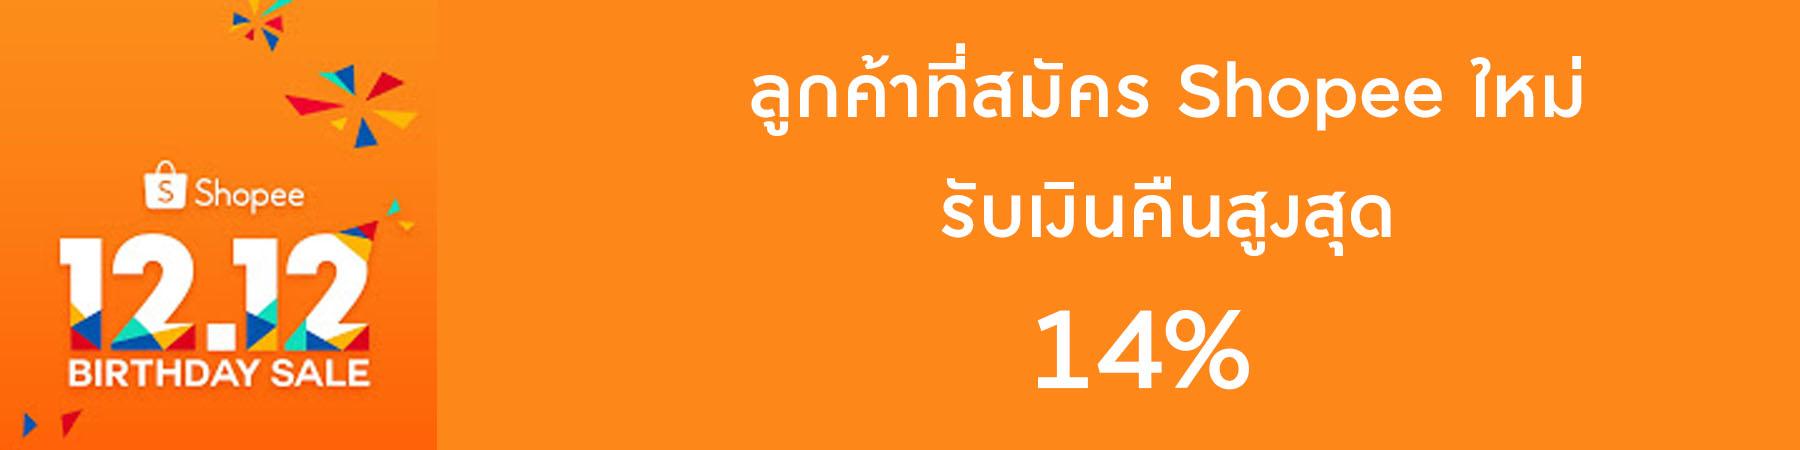 shopee 12.12 new user